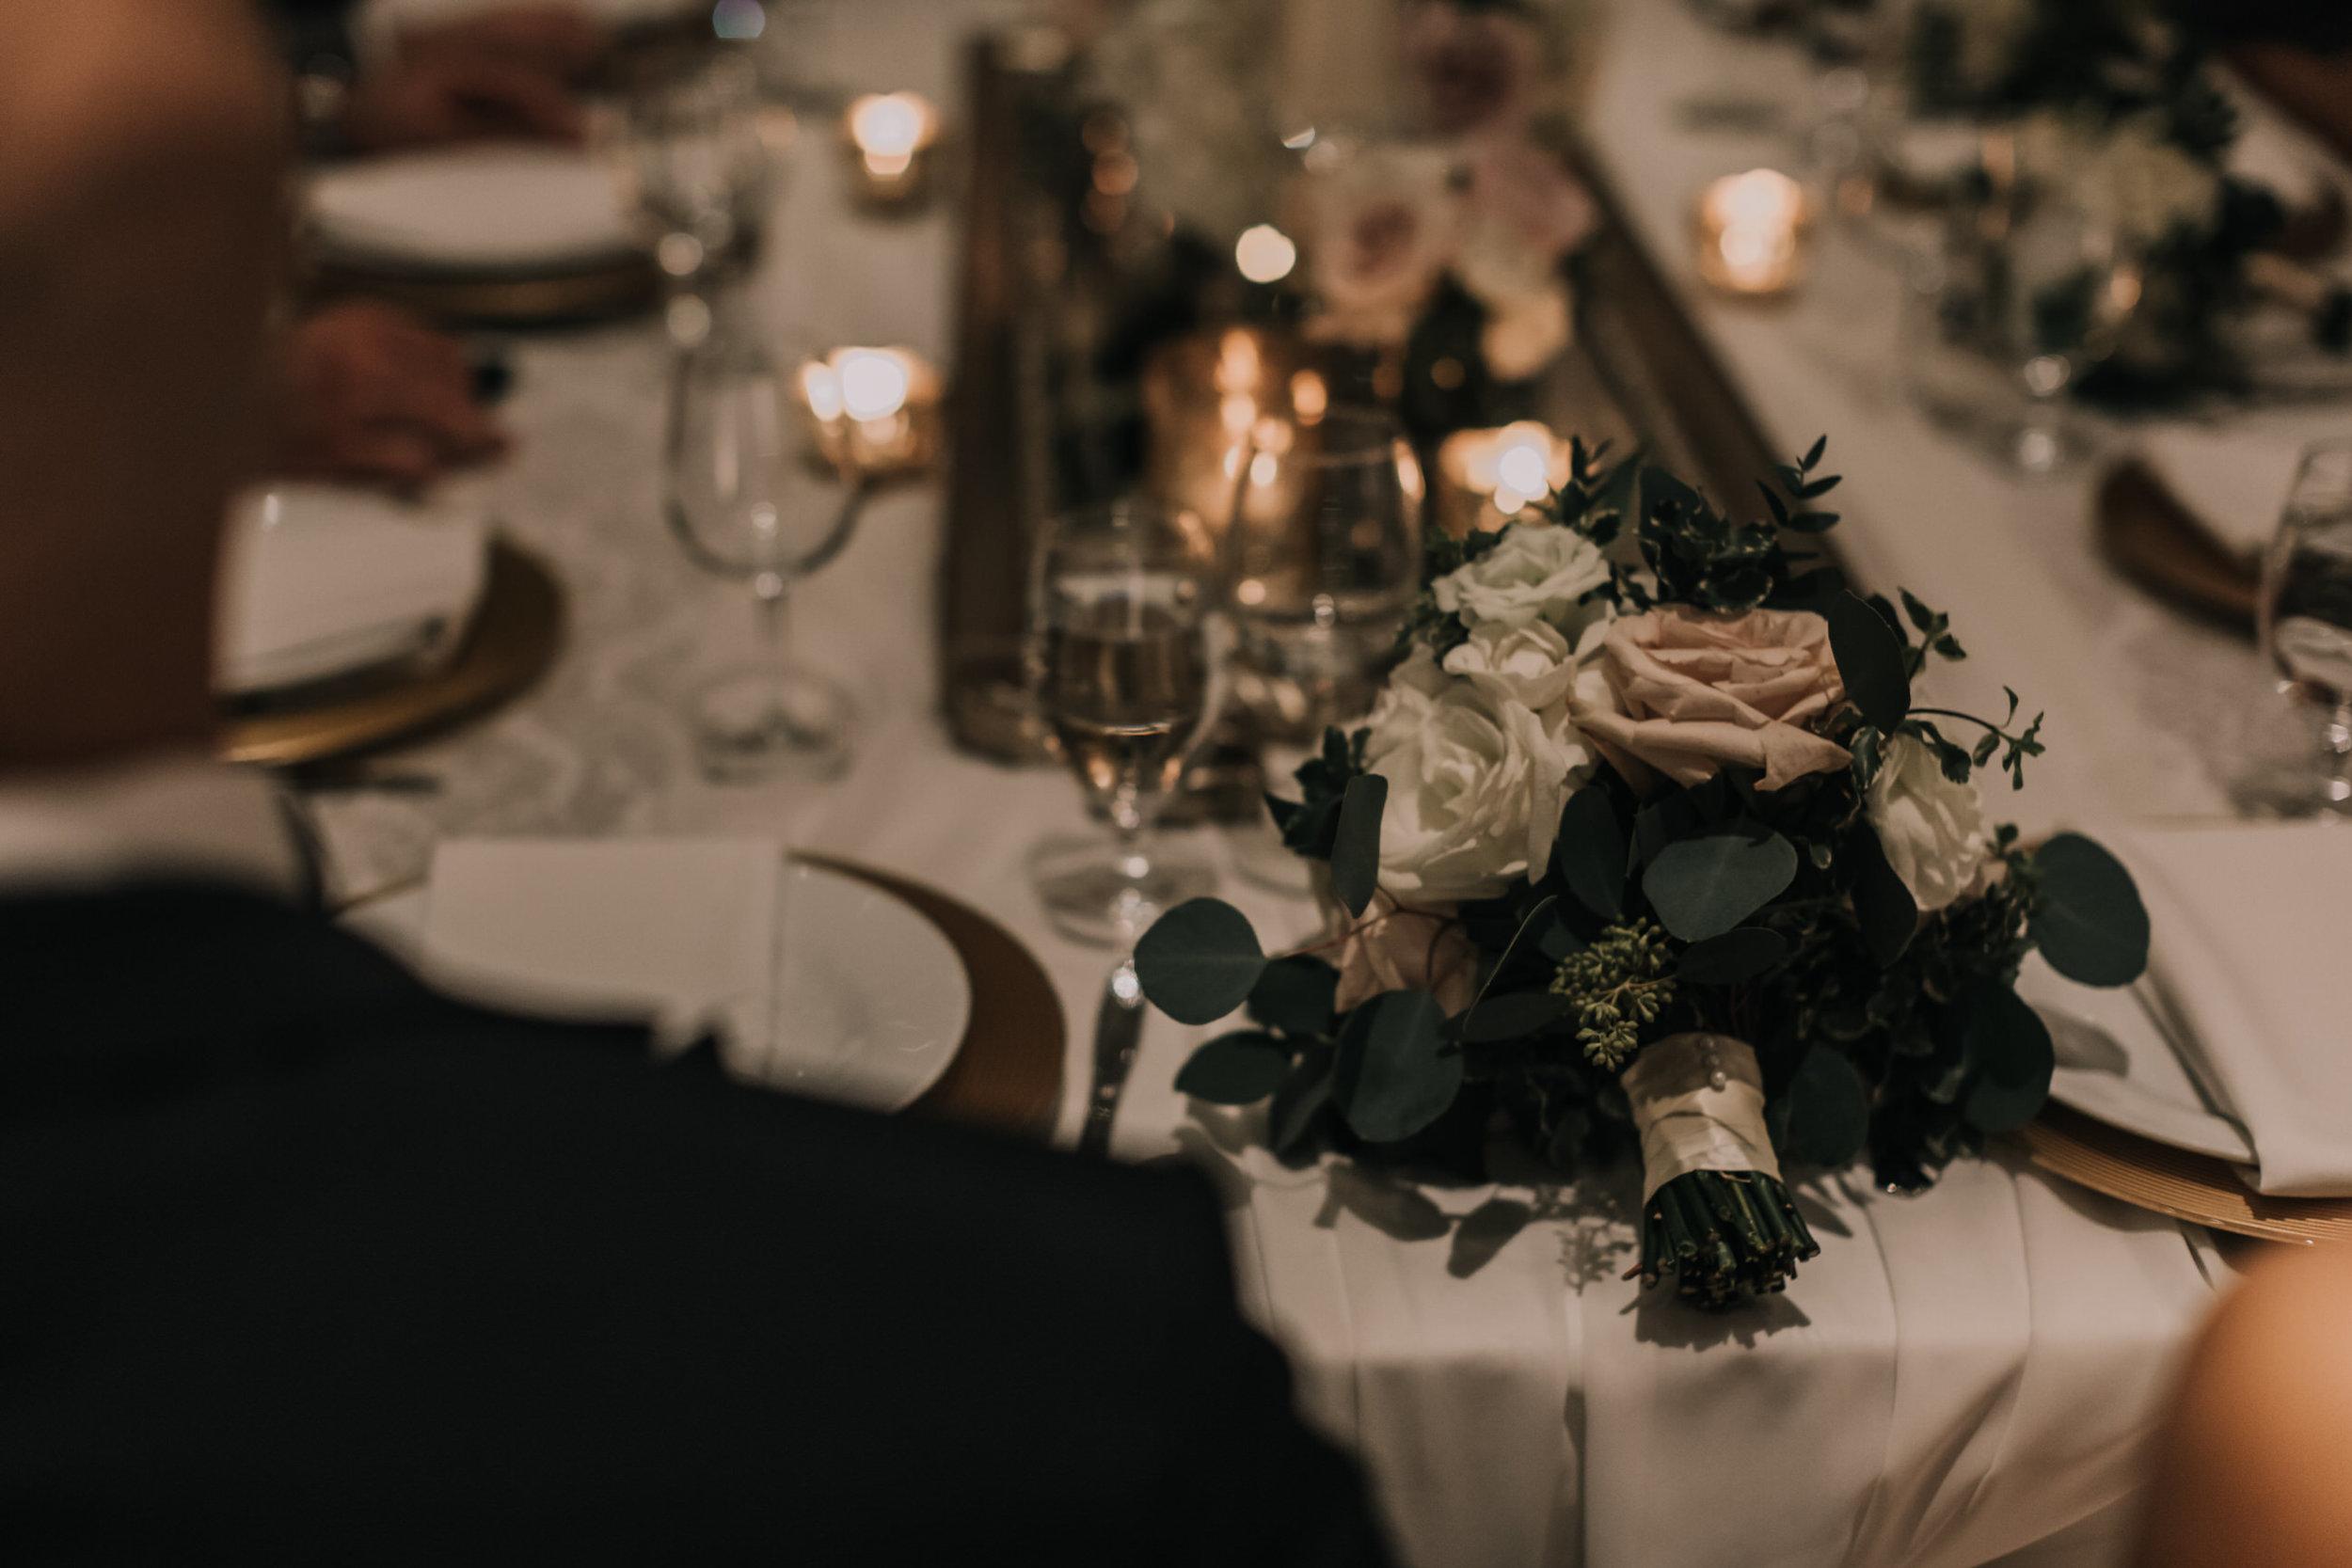 Pitt Meadows Wedding Photographer - Sky Hangar Wedding Photos - Vancouver Wedding Photographer & Videographer - Sunshine Coast Wedding Photos - Sunshine Coast Wedding Photographer - Jennifer Picard Photography - IMG_6072.jpg